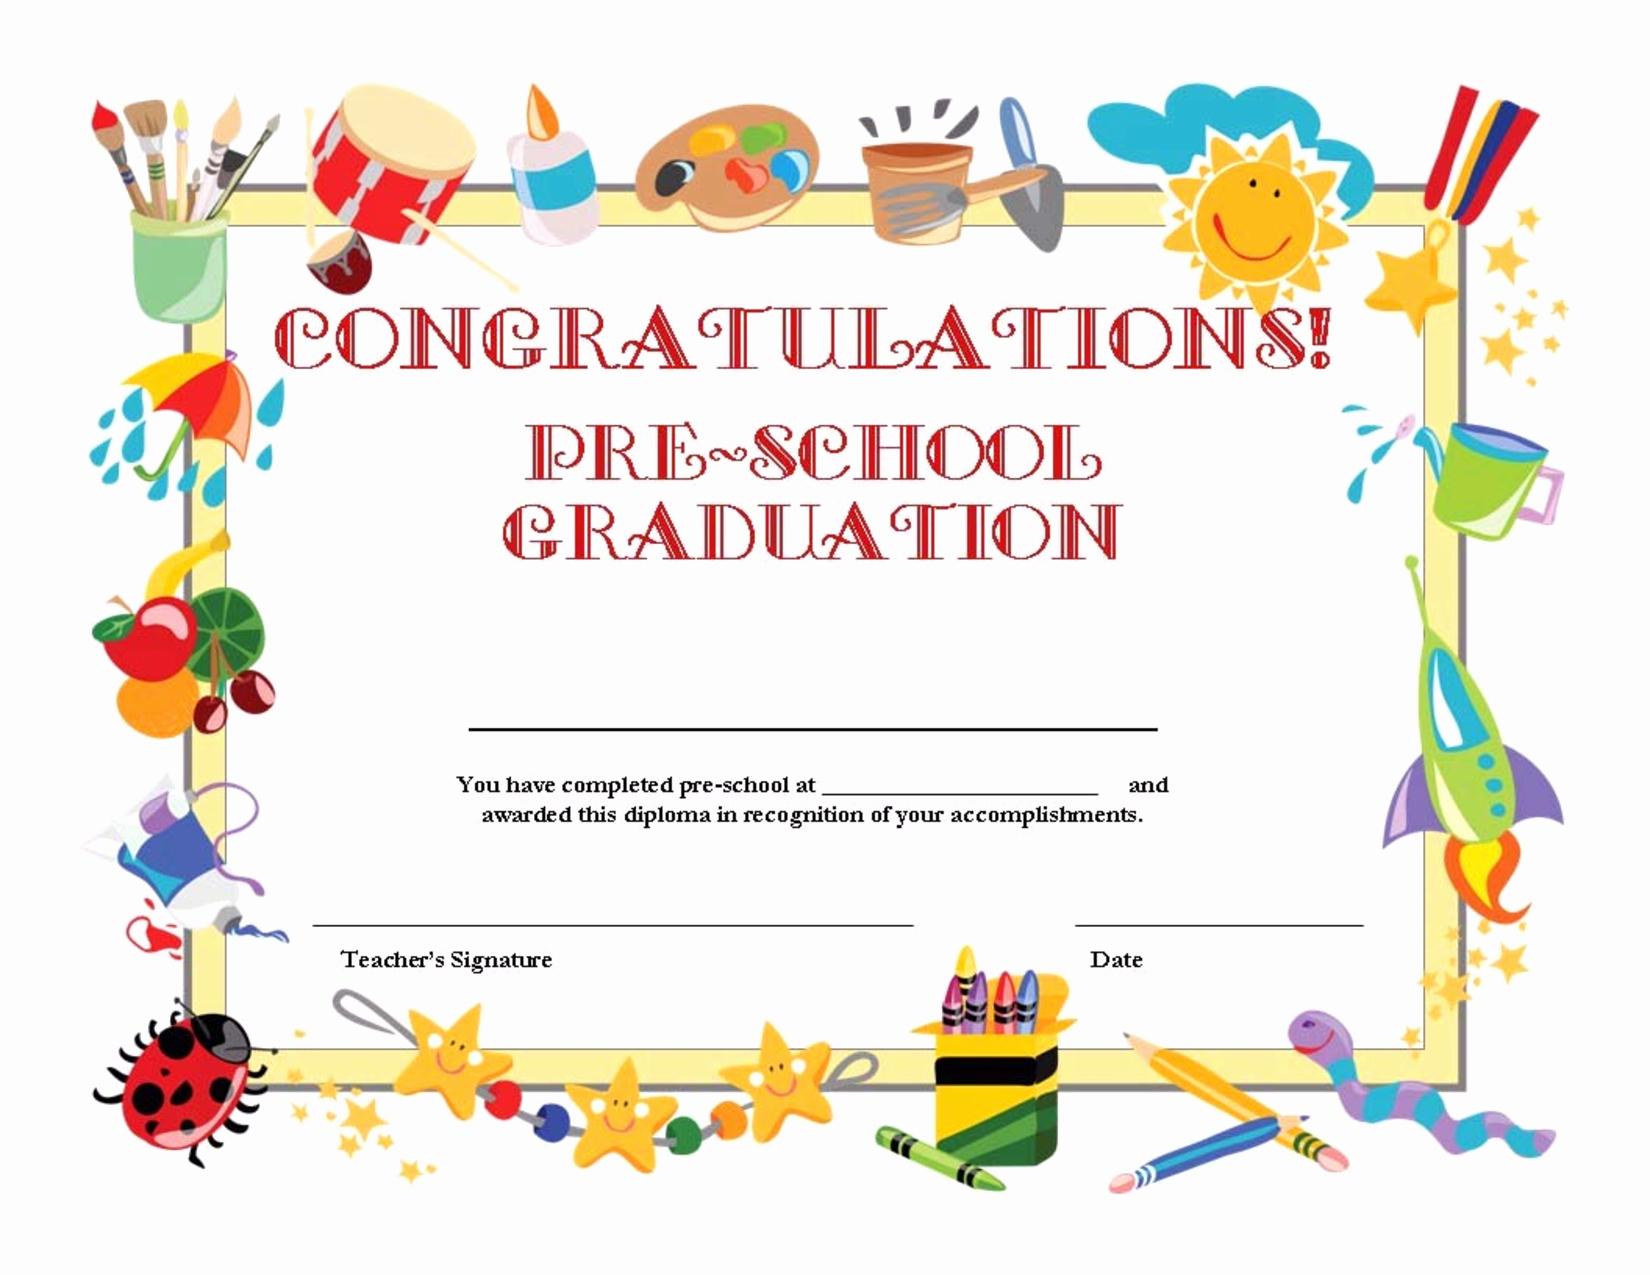 Free Printable Preschool Graduation Program Templates Elegant Templates Clipart School Certificate Pencil and In Color